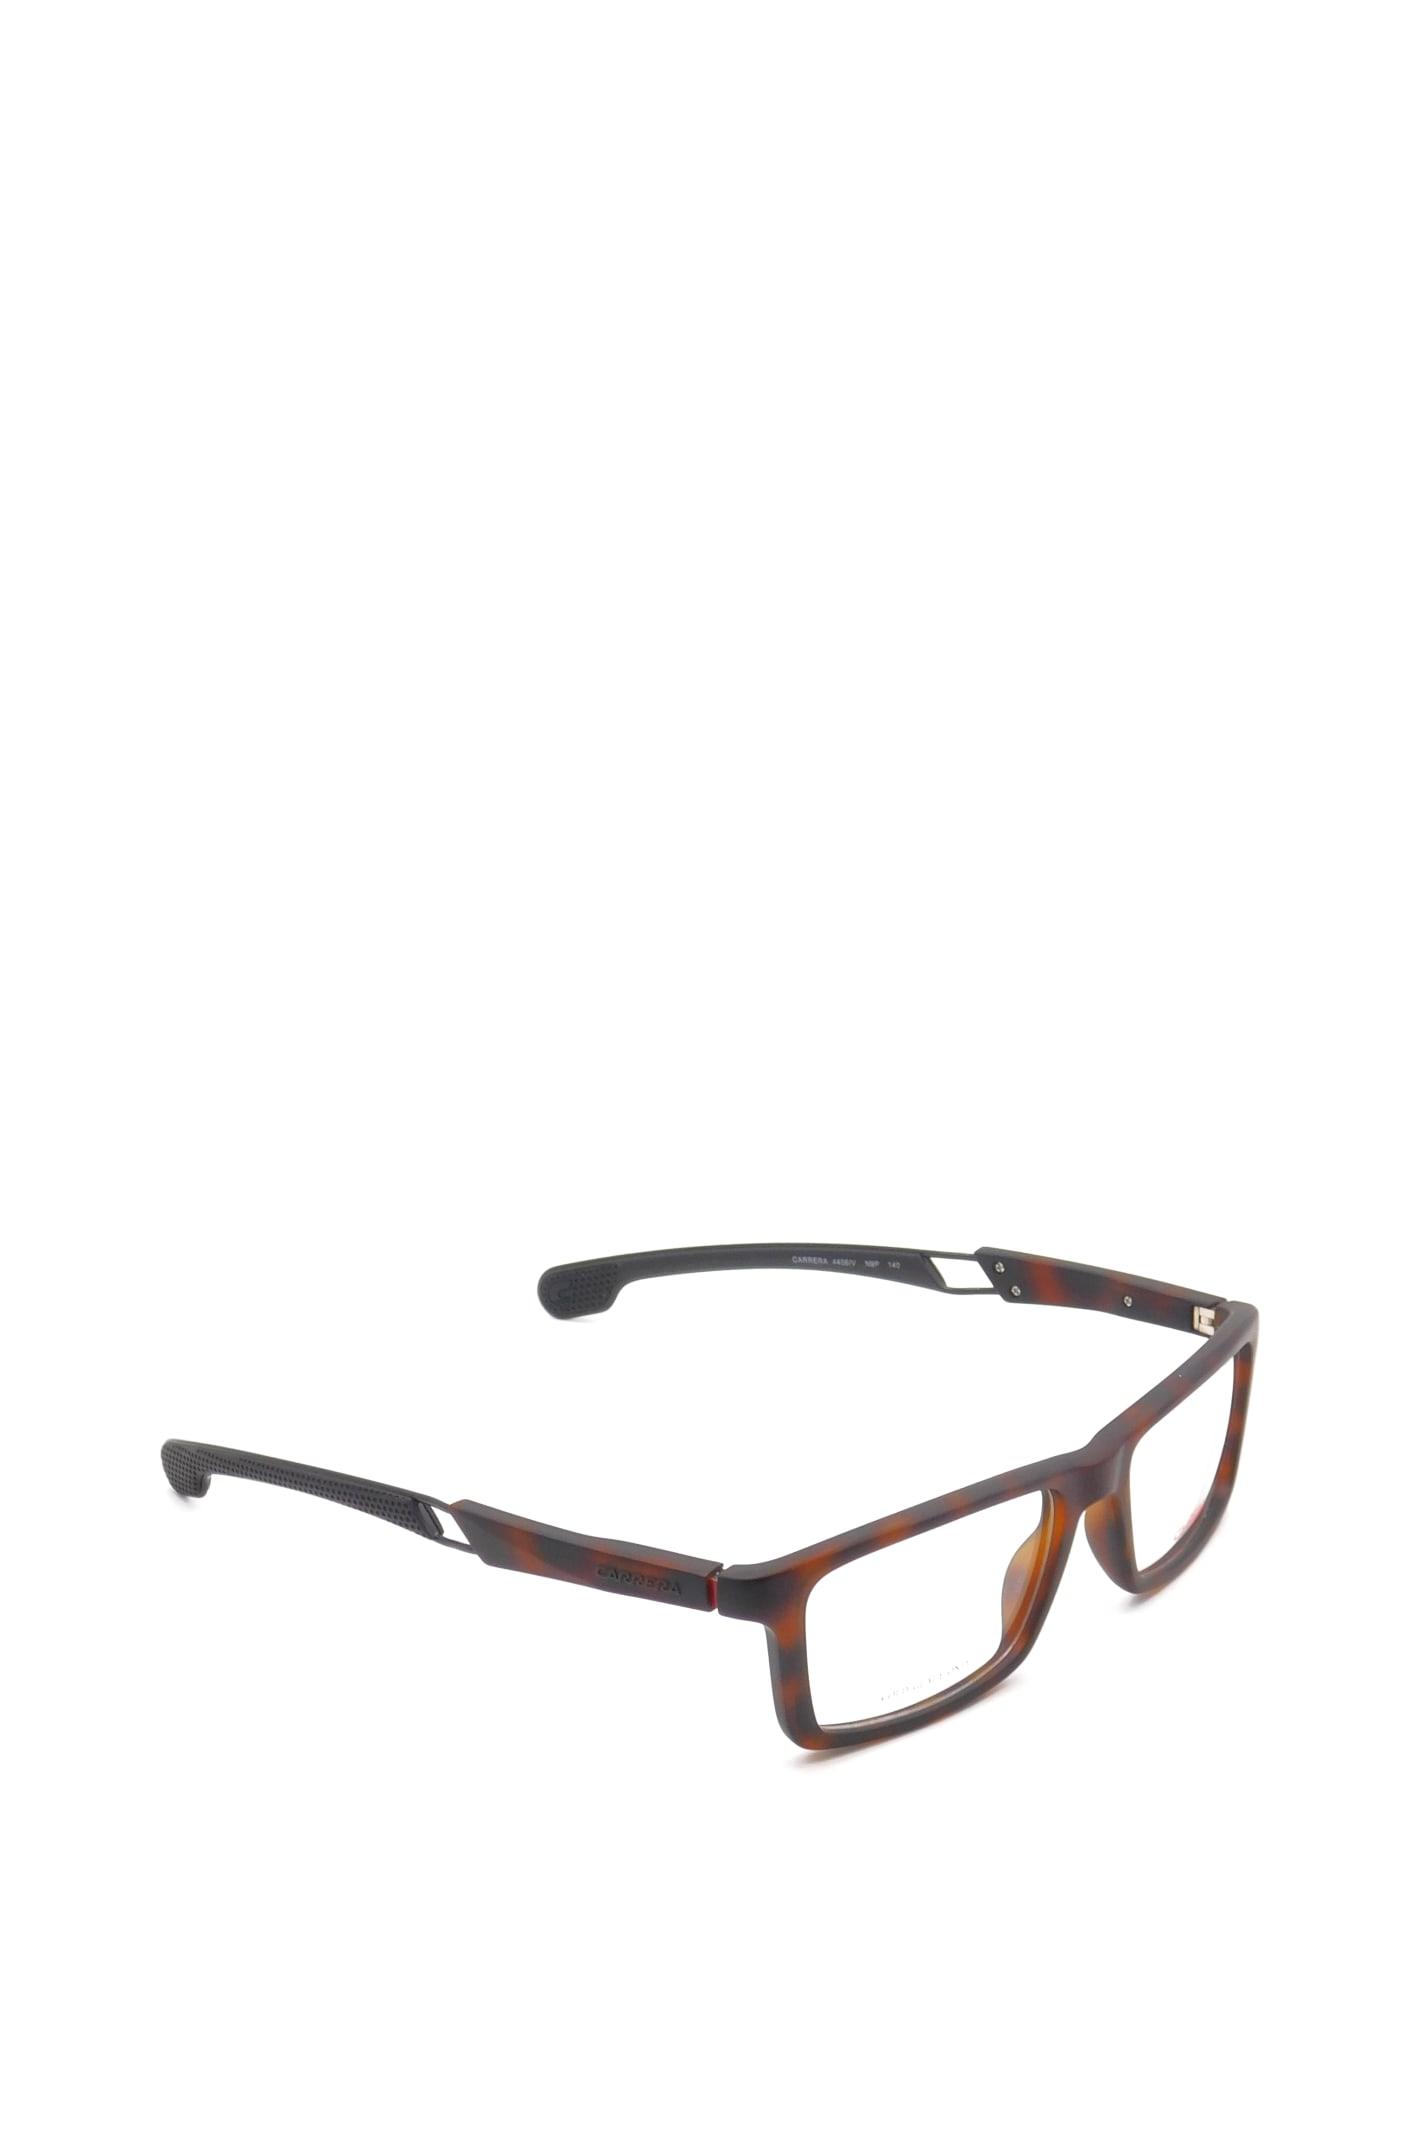 Carrera CARRERA 4406/V Eyewear